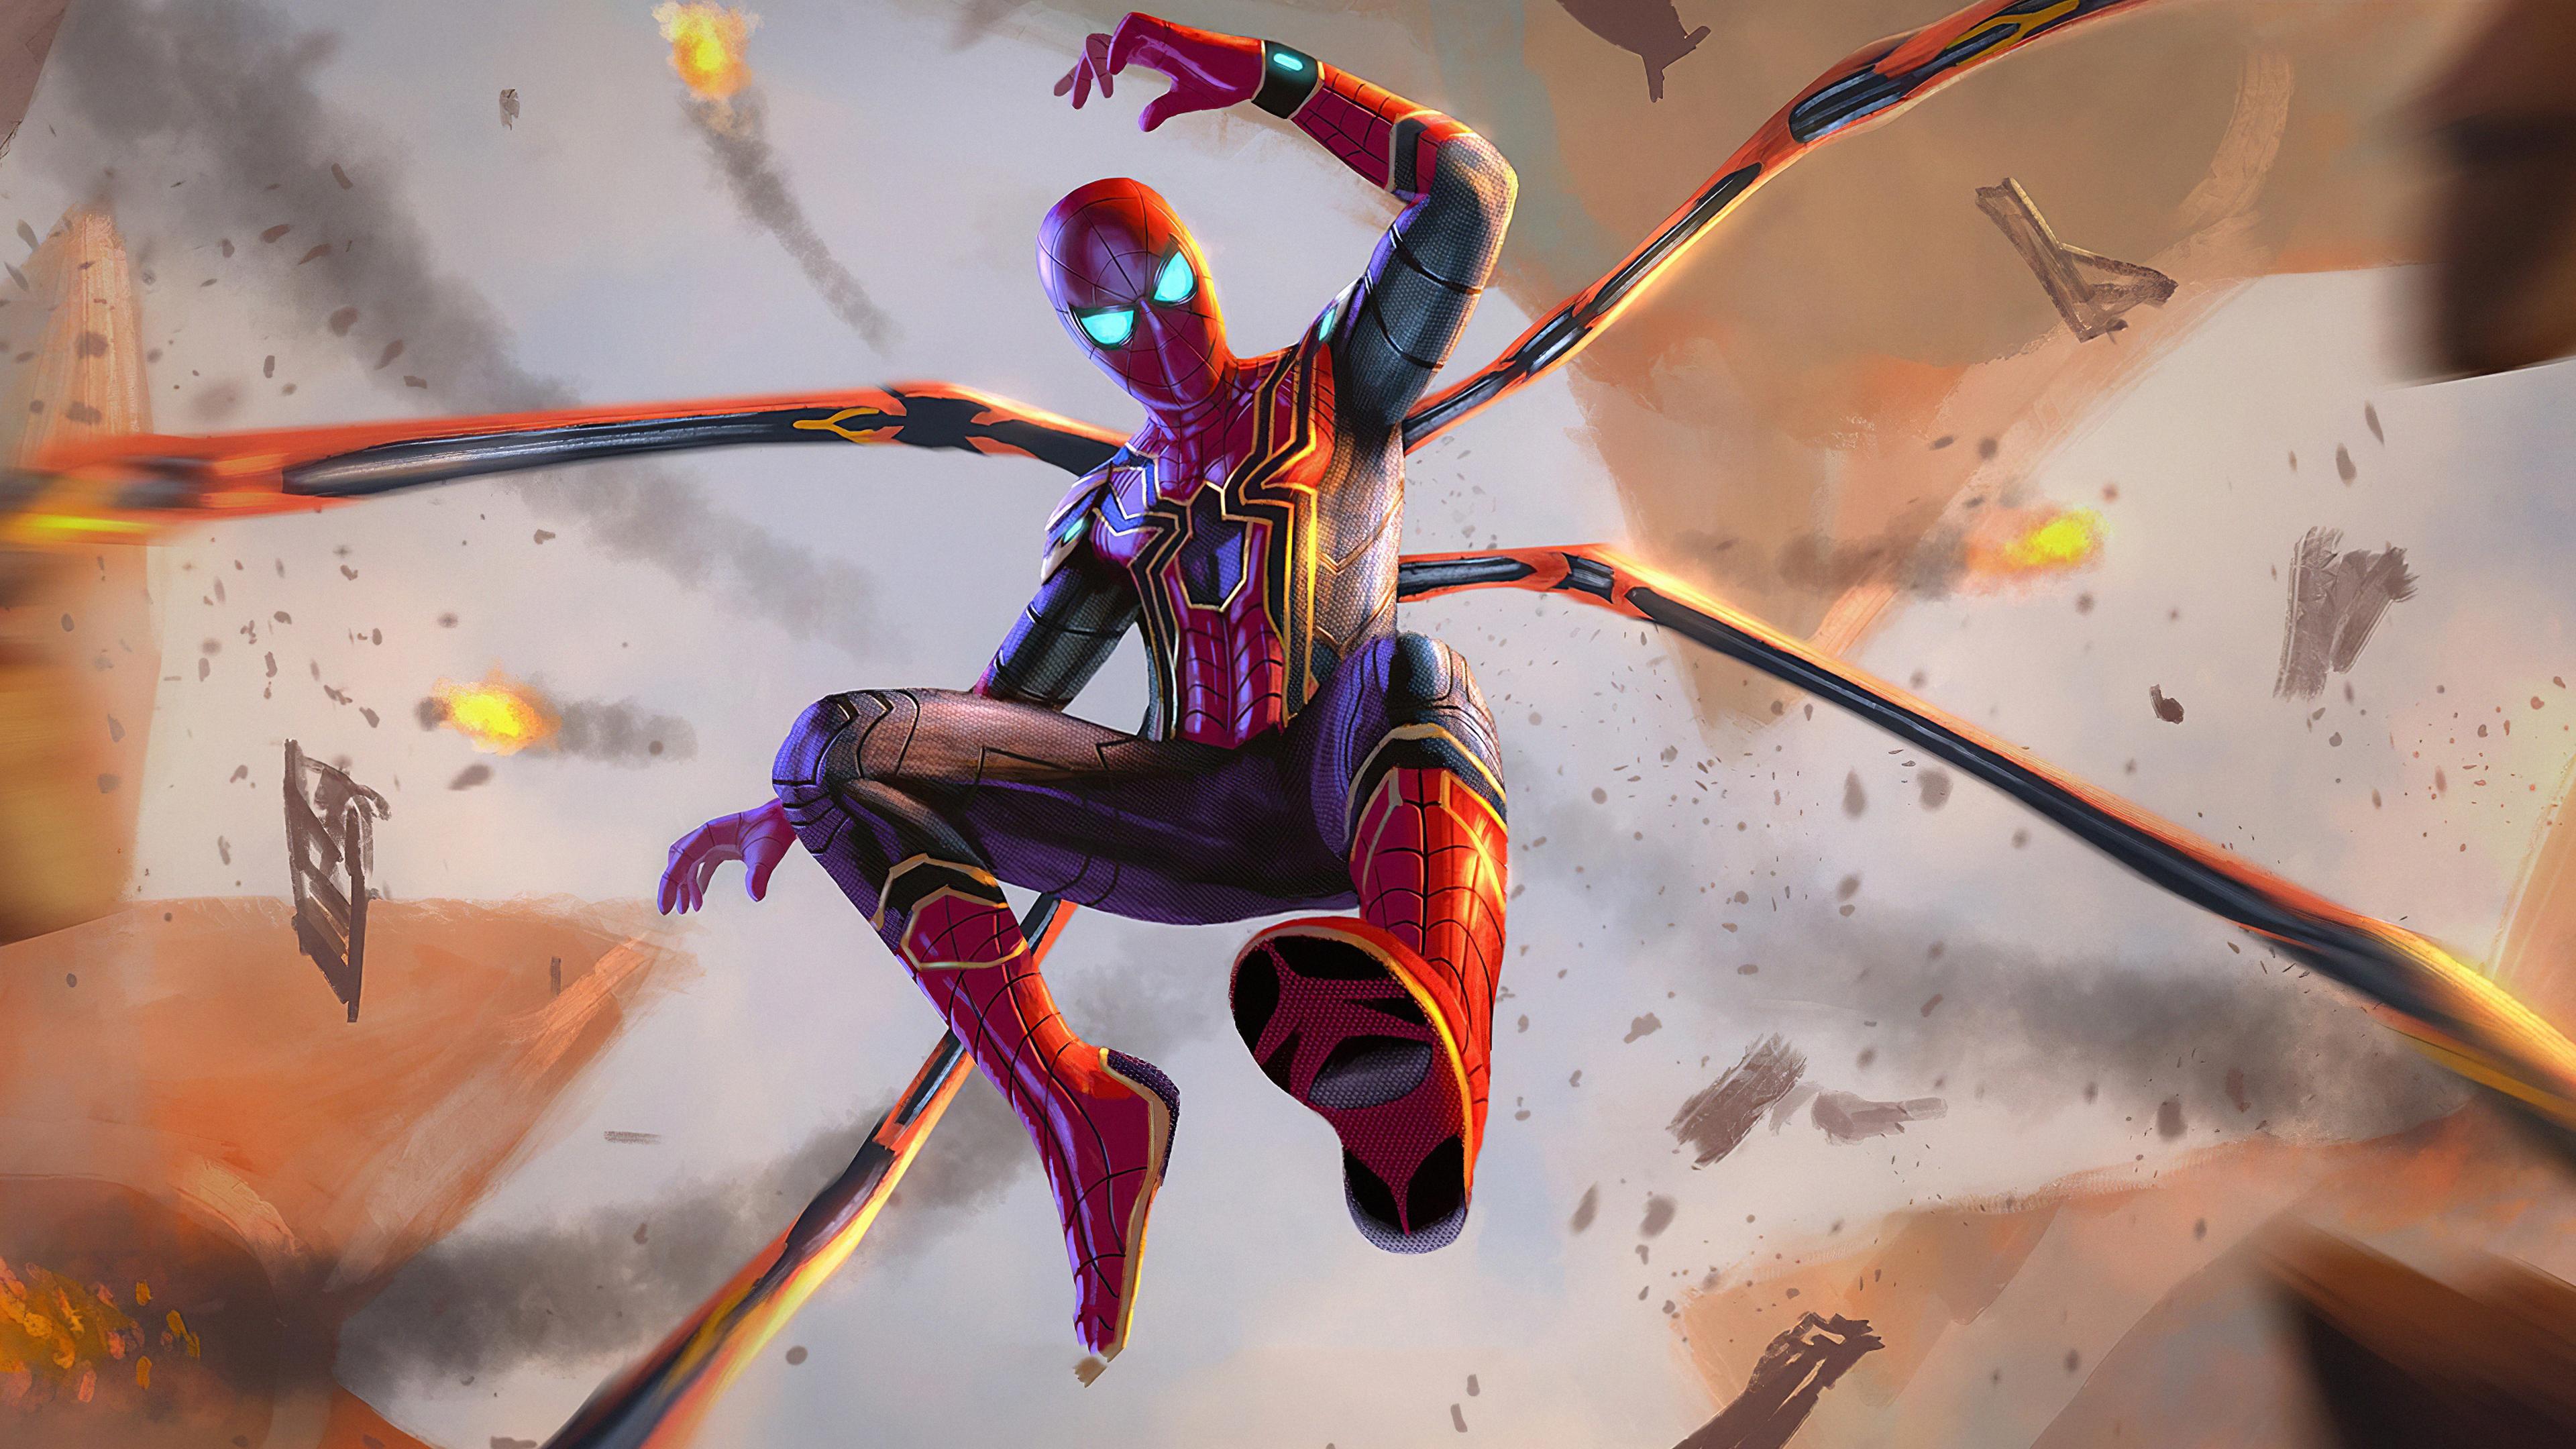 spiderman instant killer suit 1572368994 - Spiderman Instant Killer Suit - superheroes wallpapers, spiderman wallpapers, hd-wallpapers, digital art wallpapers, artwork wallpapers, art wallpapers, 4k-wallpapers